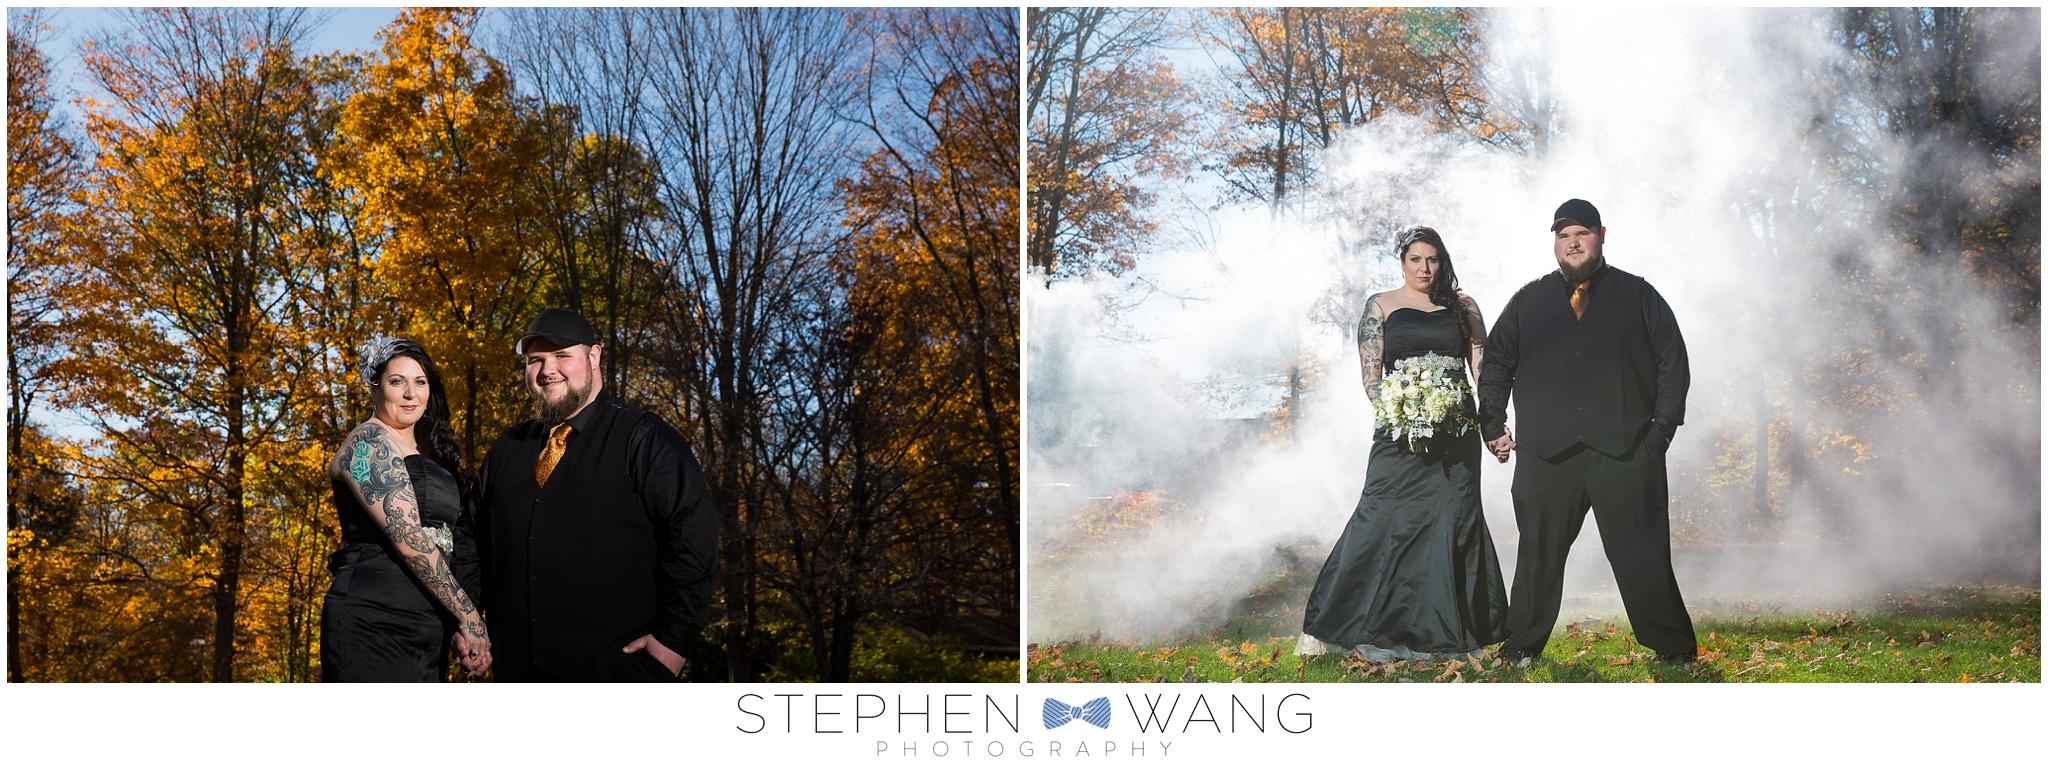 Stephen Wang Photography Wedding Connecticut CT Bill Miller's Castle Branford CT Halloween New England Wedding New Haven-12-02_0010.jpg